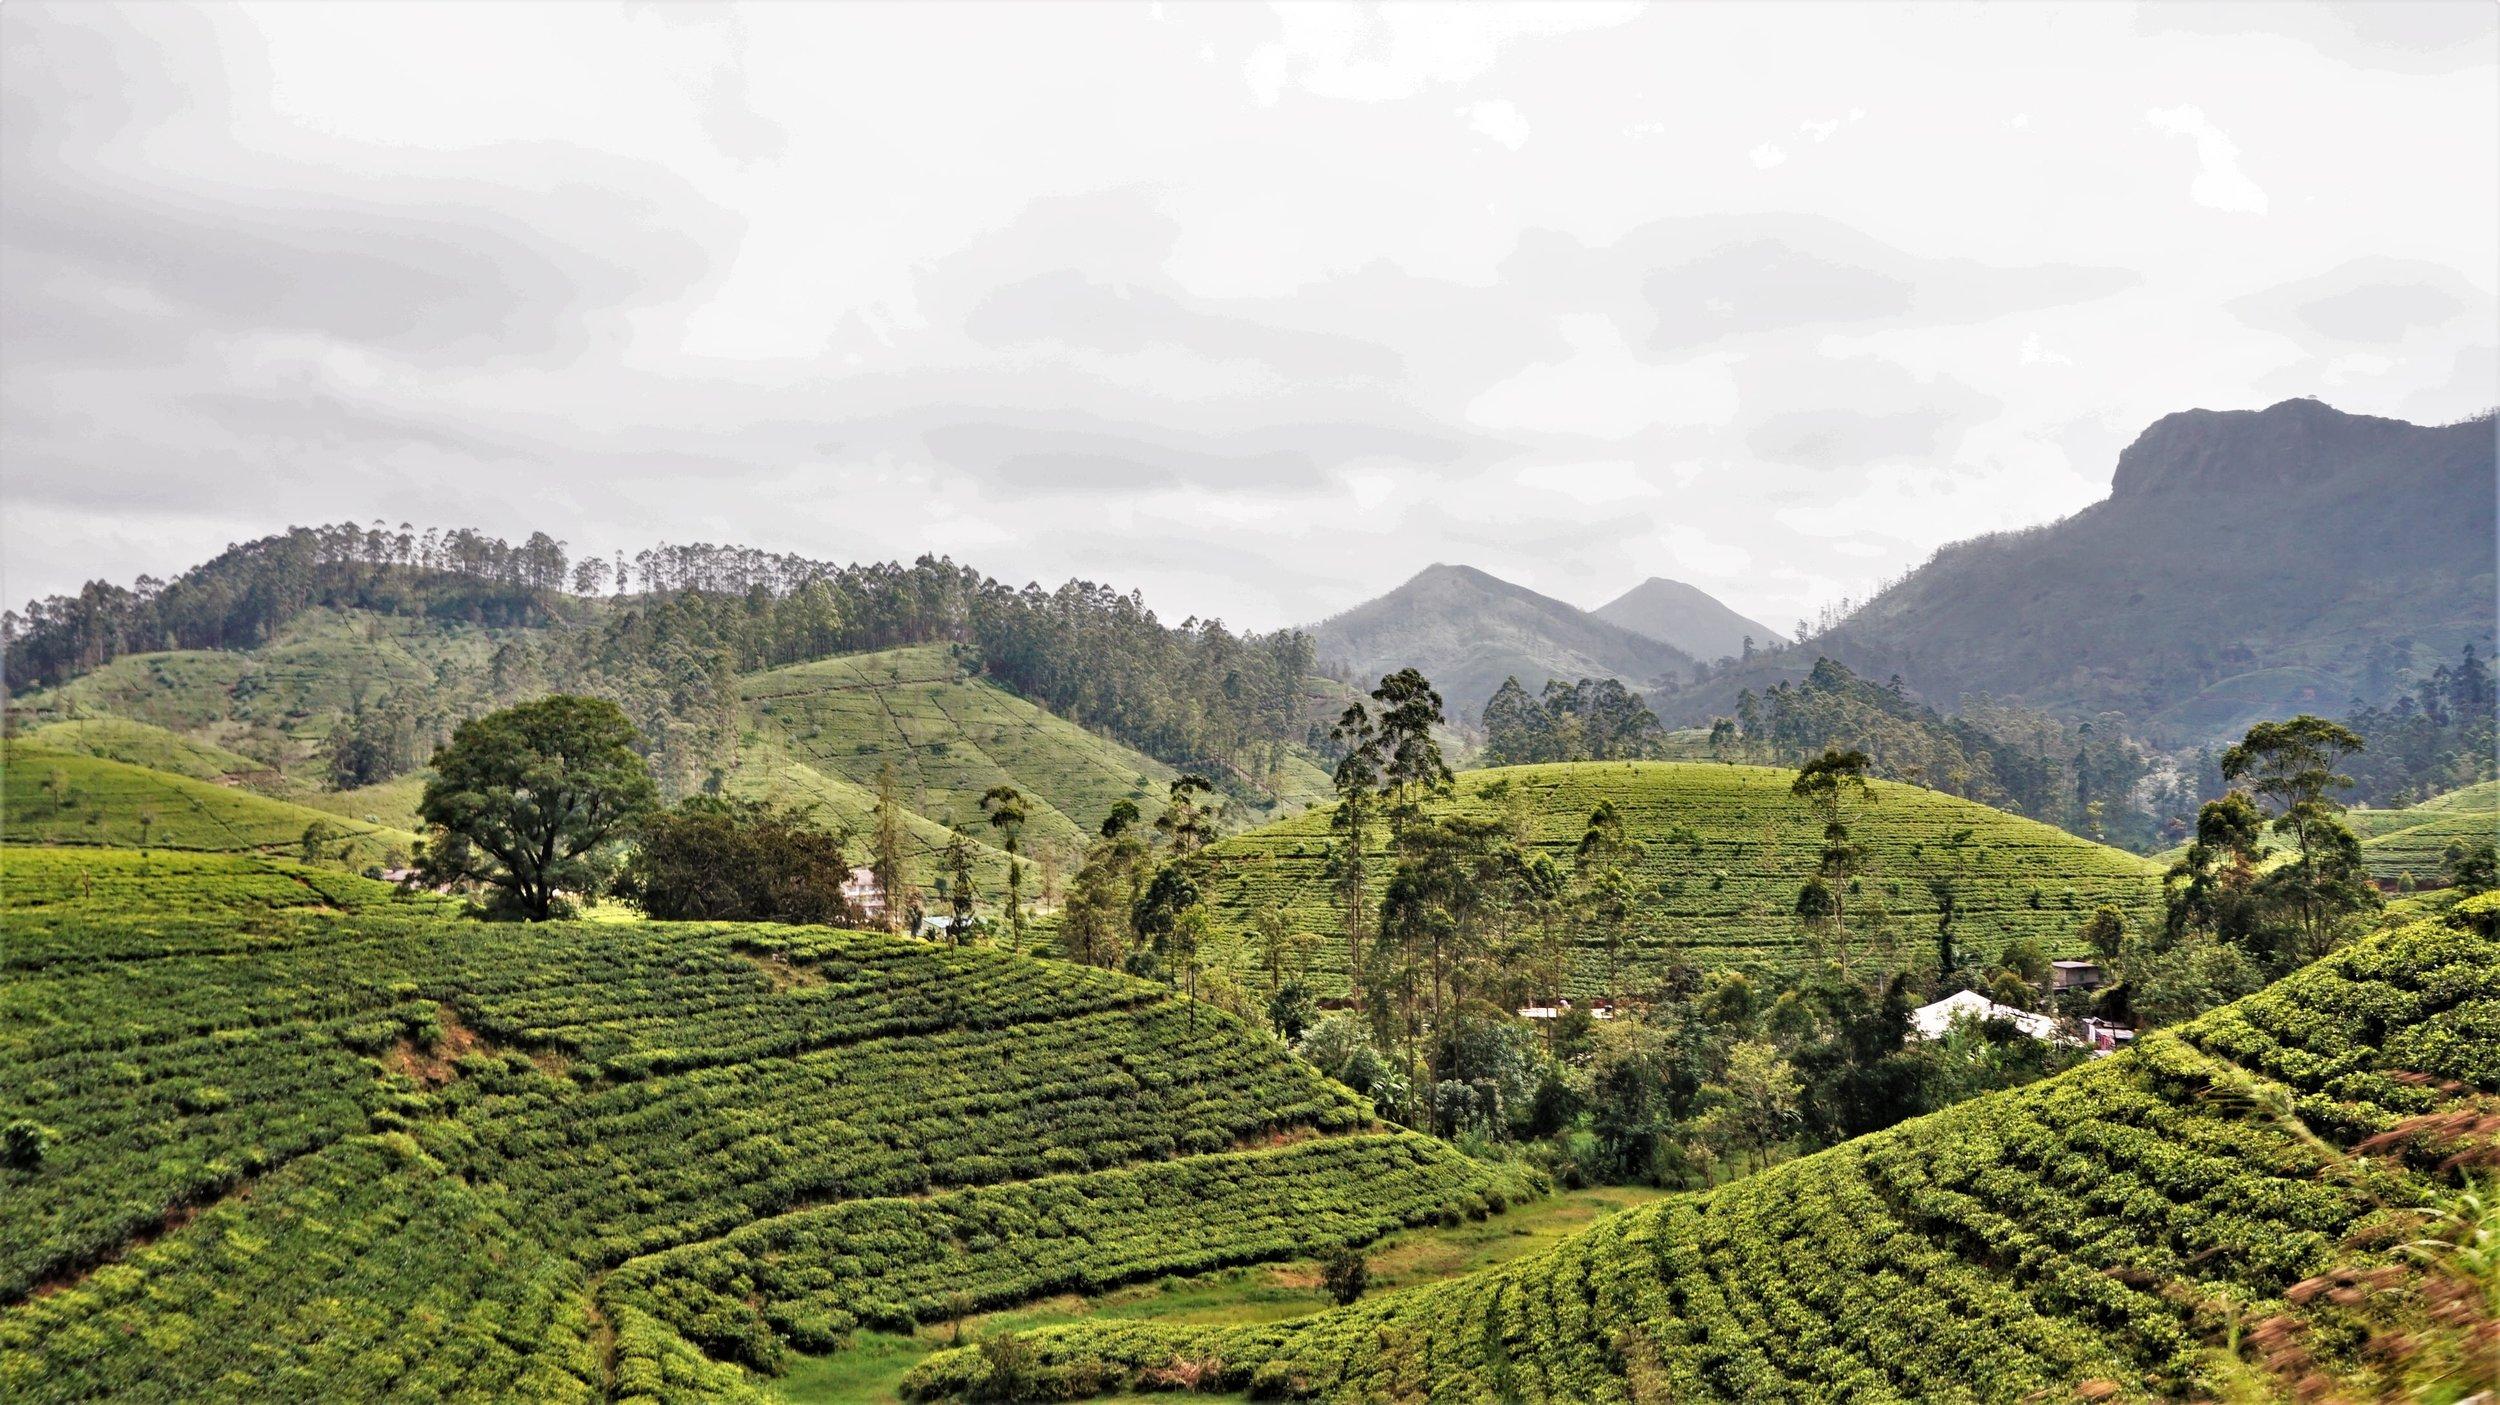 views over the tea fields in Sri Lanka, a must-see in Sri Lanka